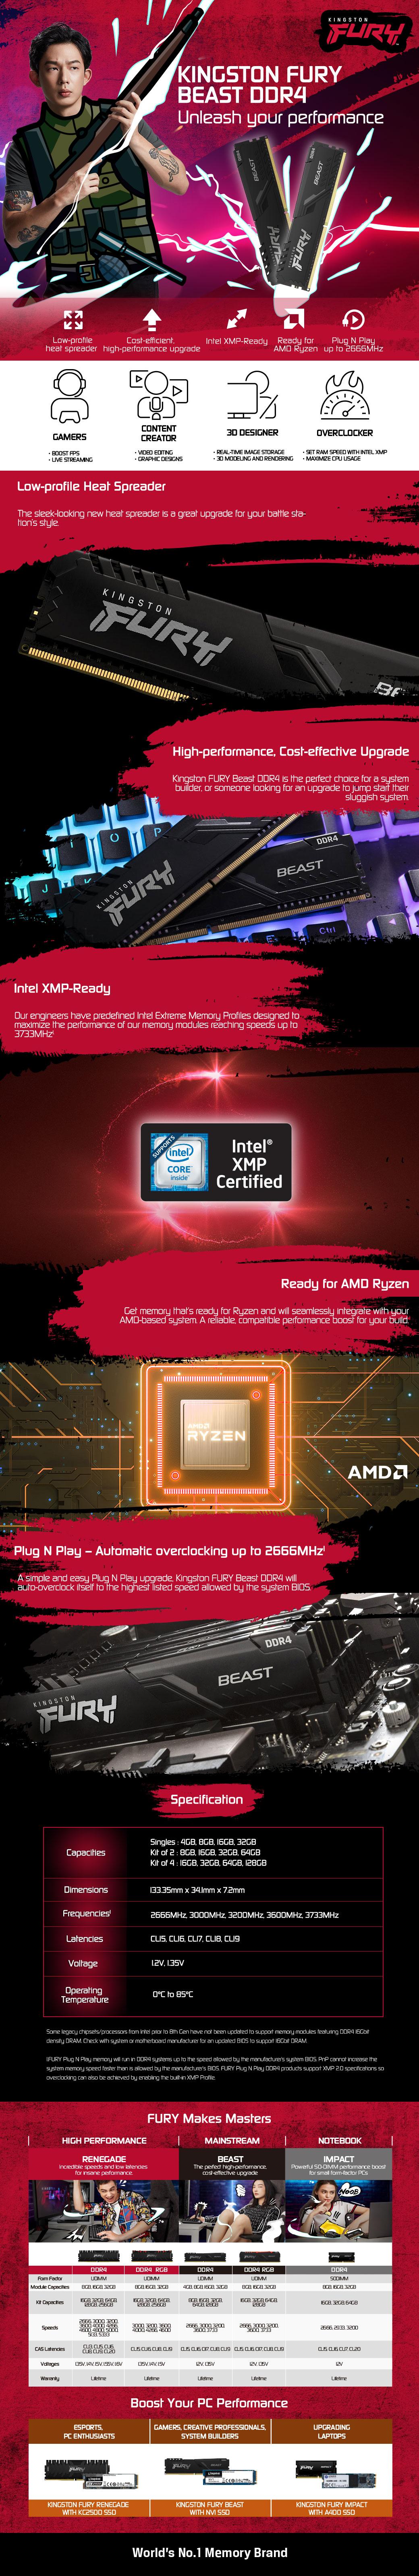 Kingstno FURY Beast DDR4_Etail banner_EN.jpg